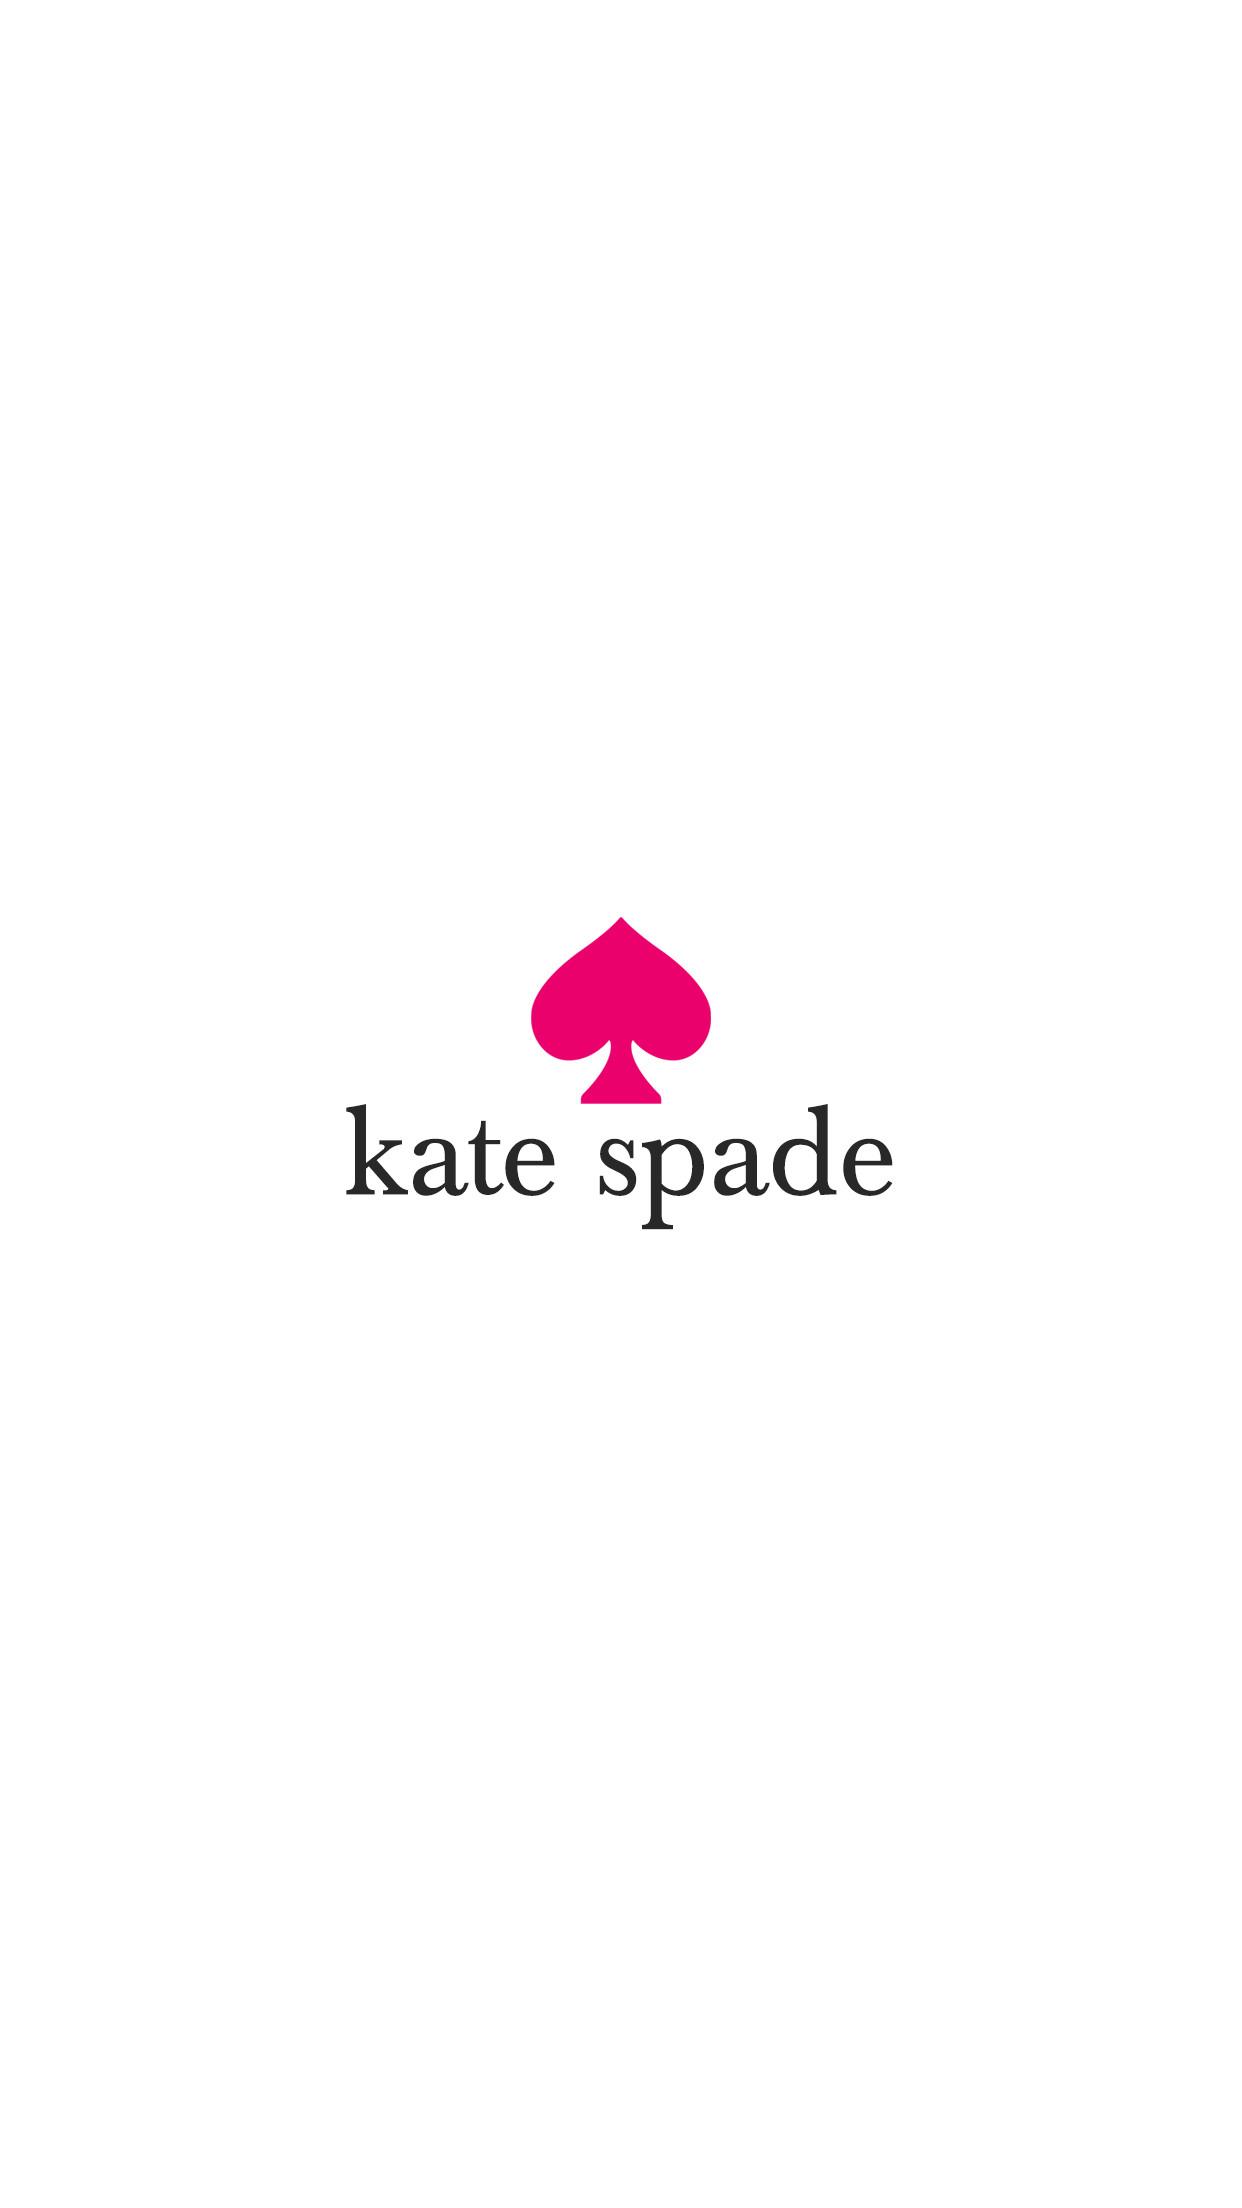 Kate spade hot pink iPhone Wallpaper Background